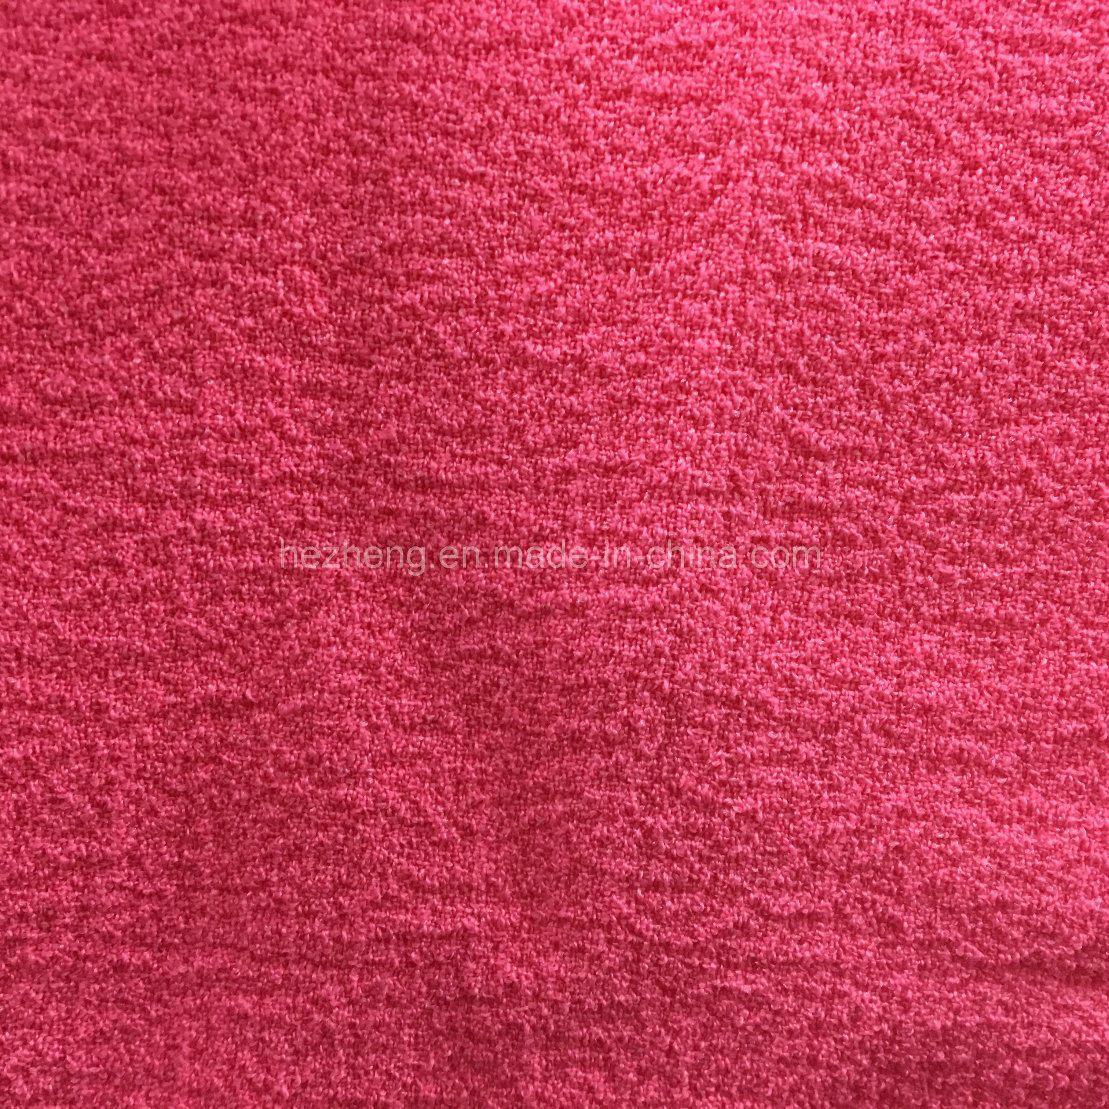 Hzs00471 Polyeser Garment Dress Georgette